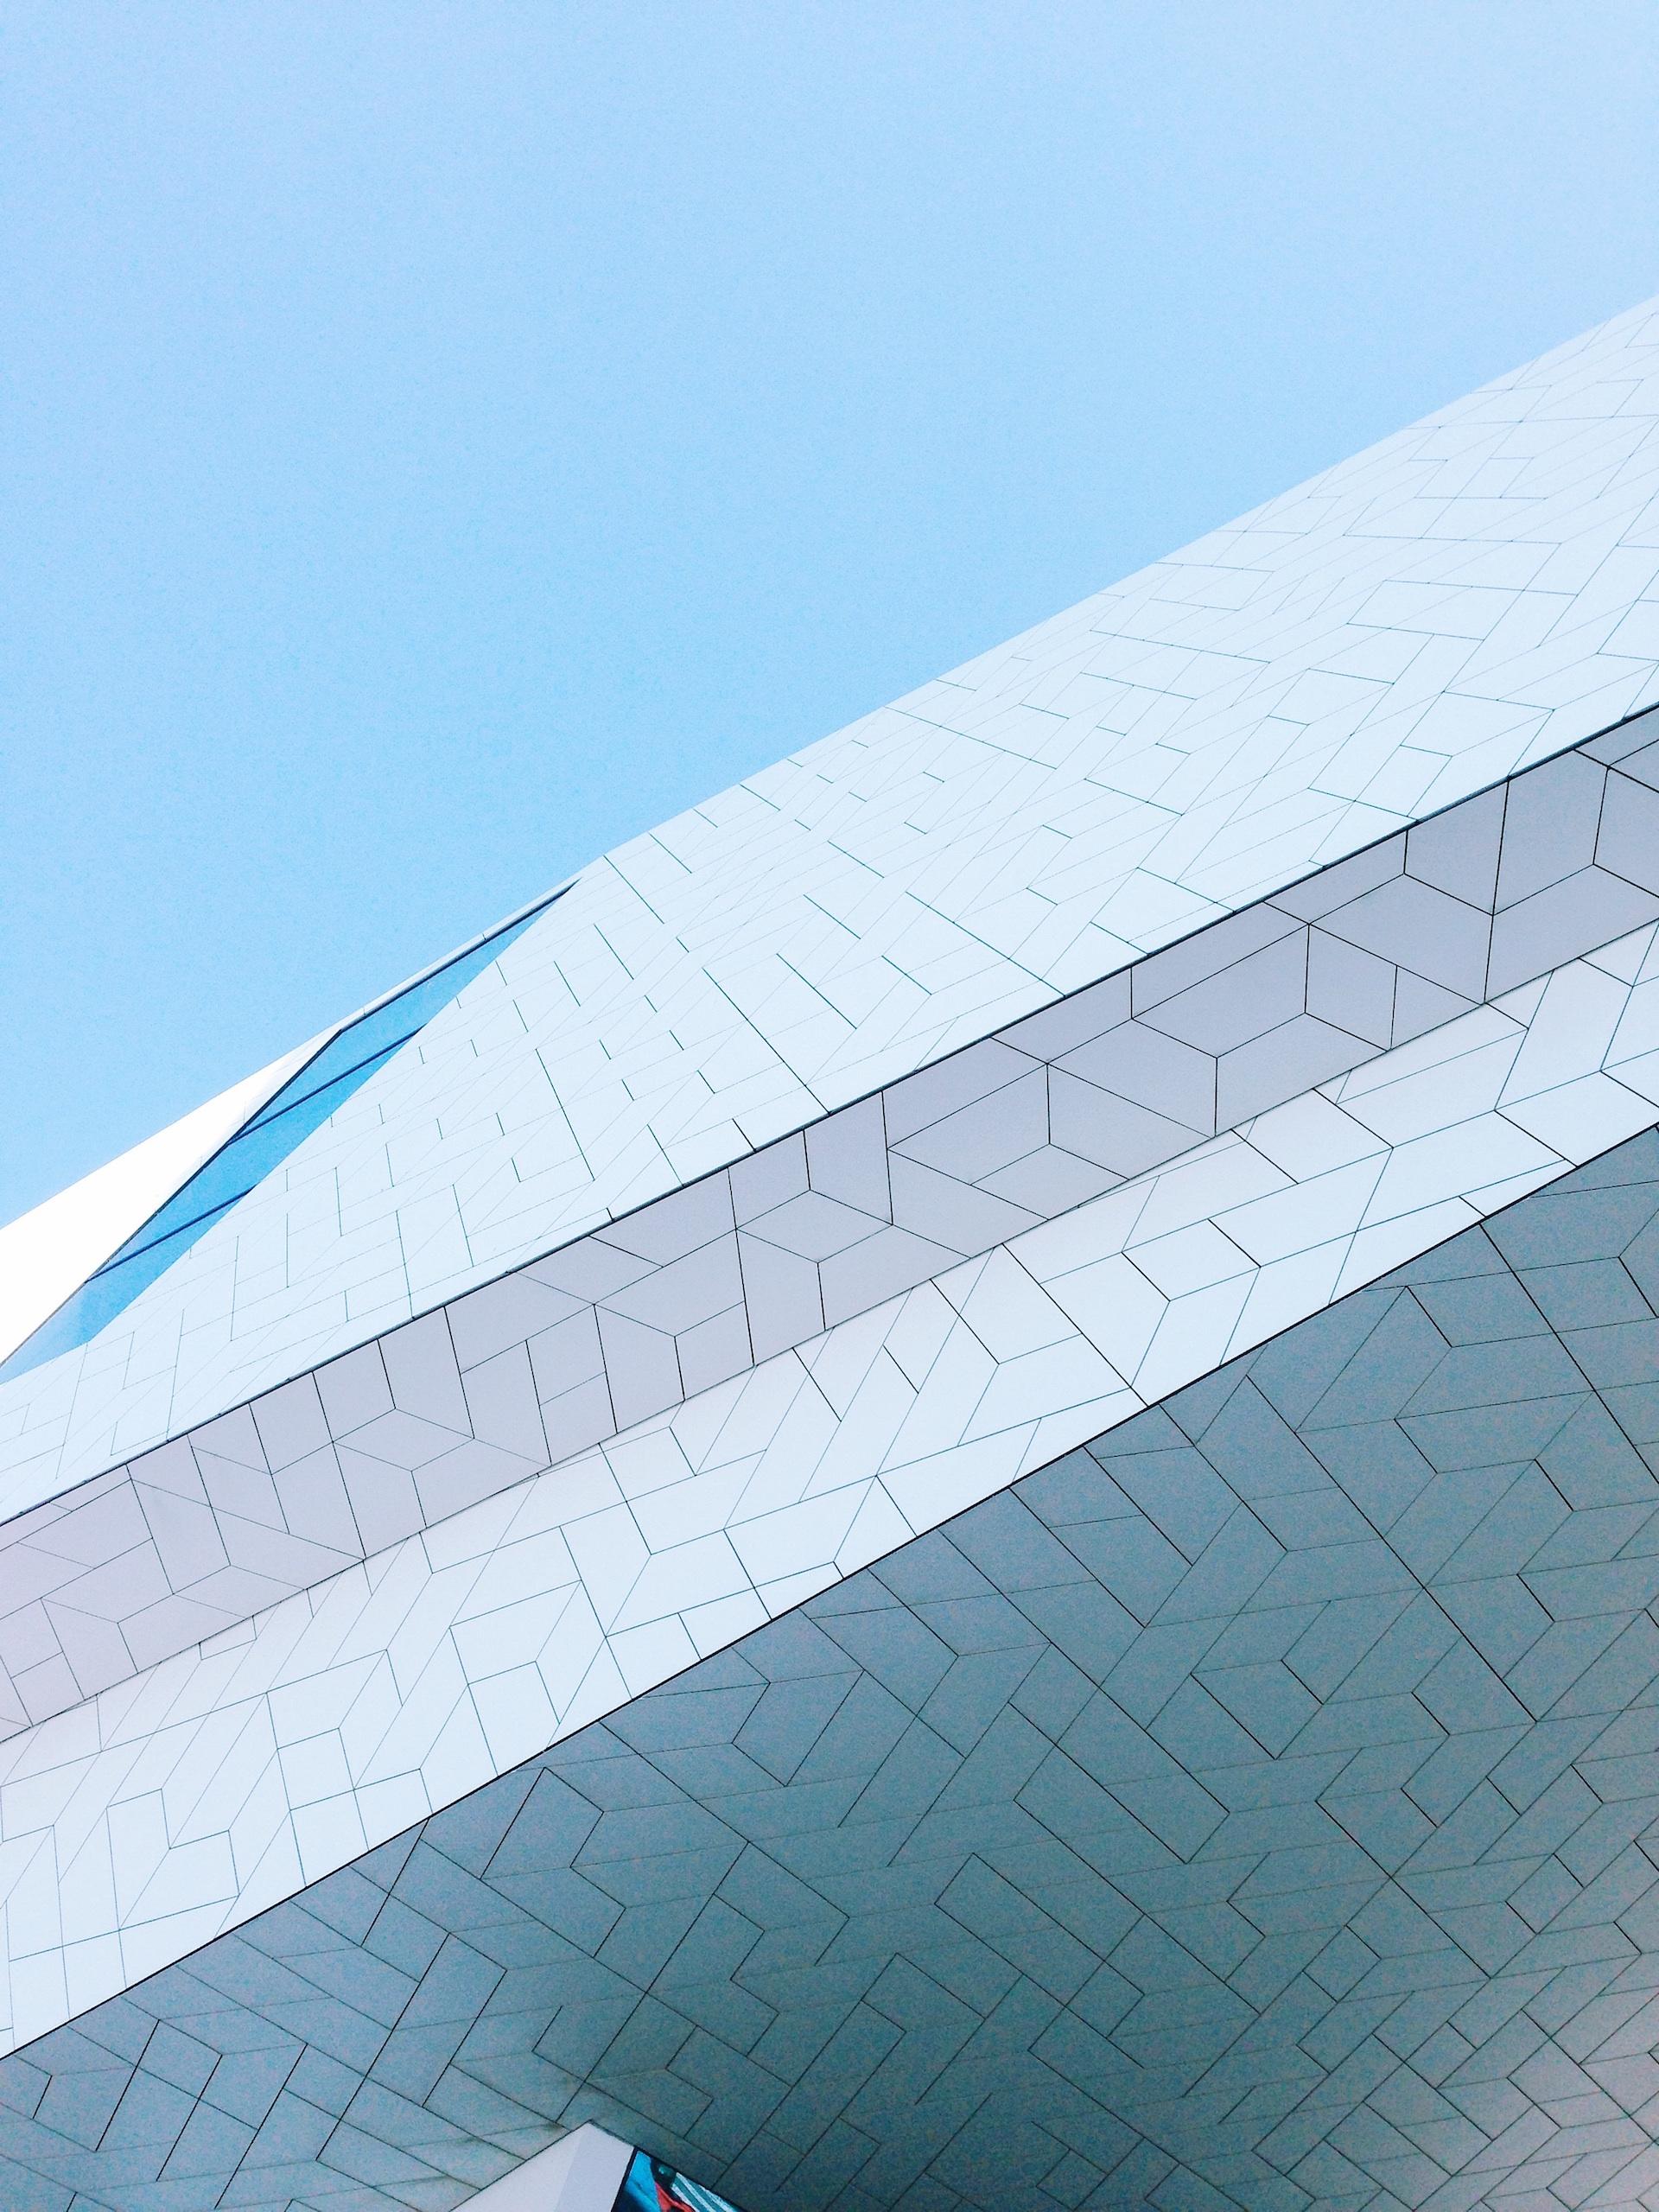 edificio, fachada, arquitectura, diseño, modernidad - Fondos de Pantalla HD - professor-falken.com